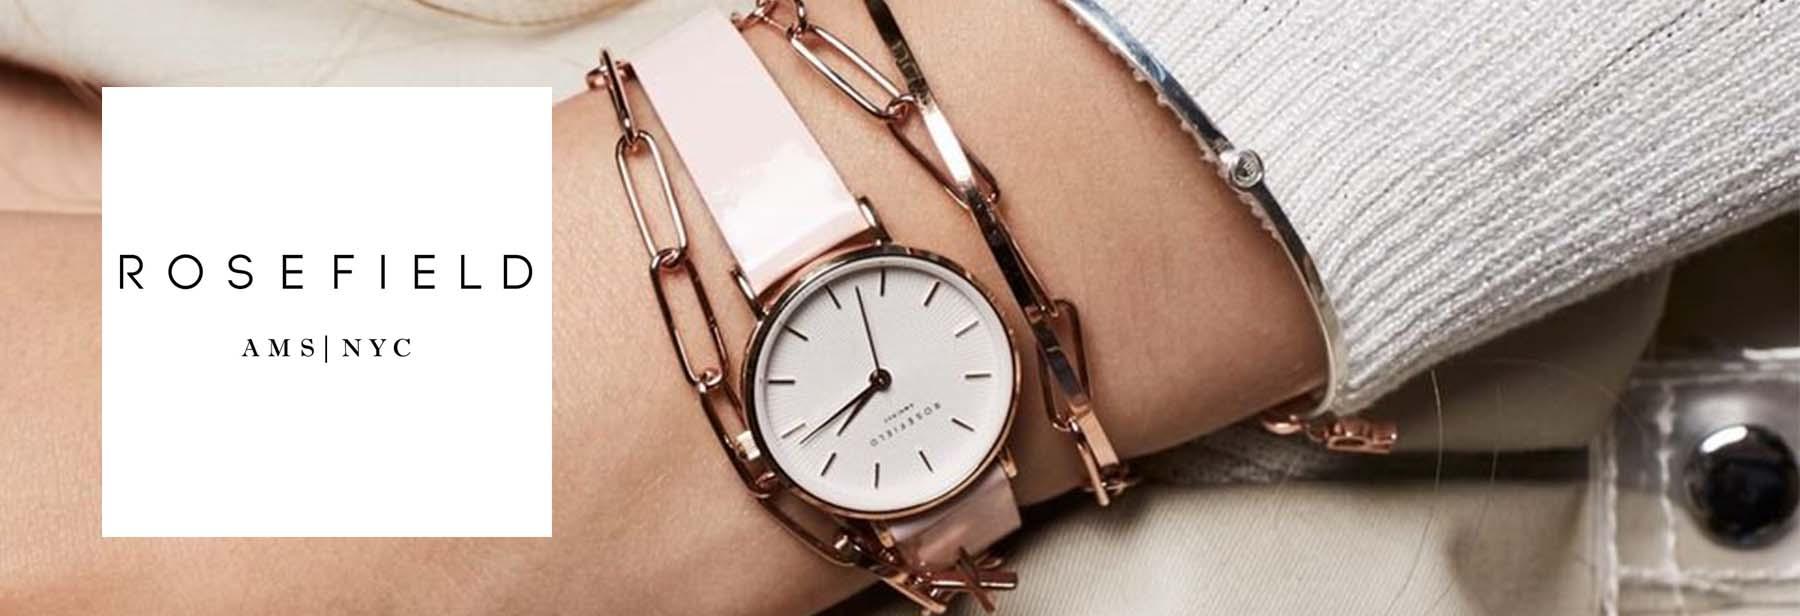 rosefield orologi donna minimal